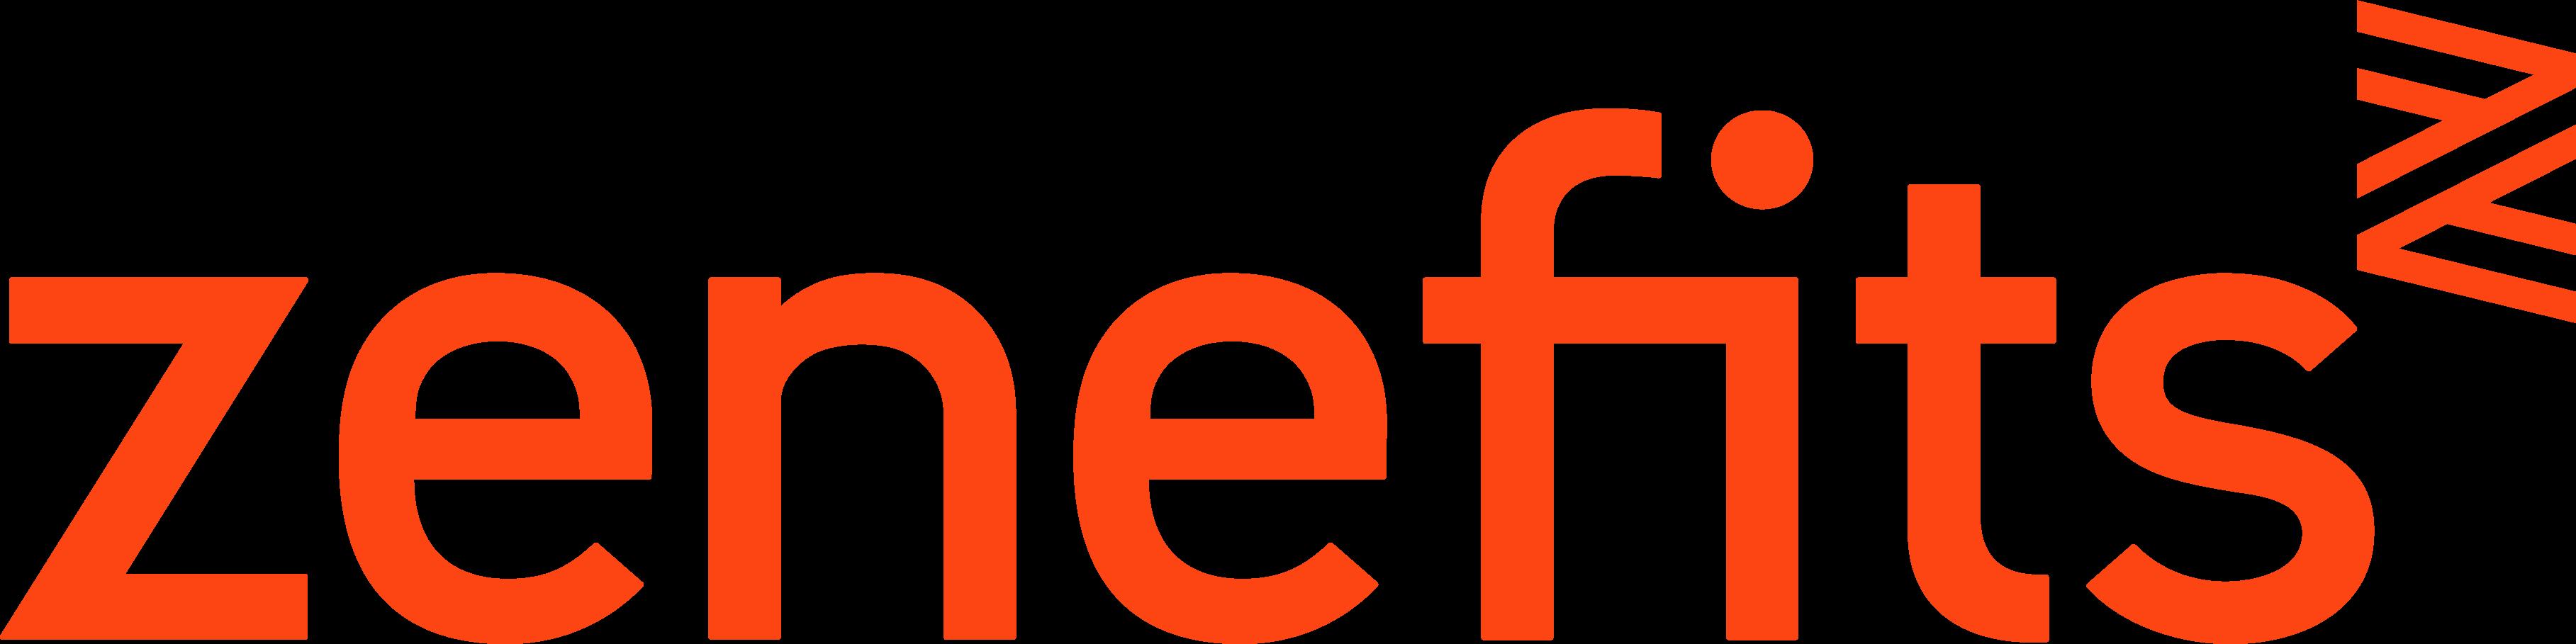 Zenefits: Duo Case Study.